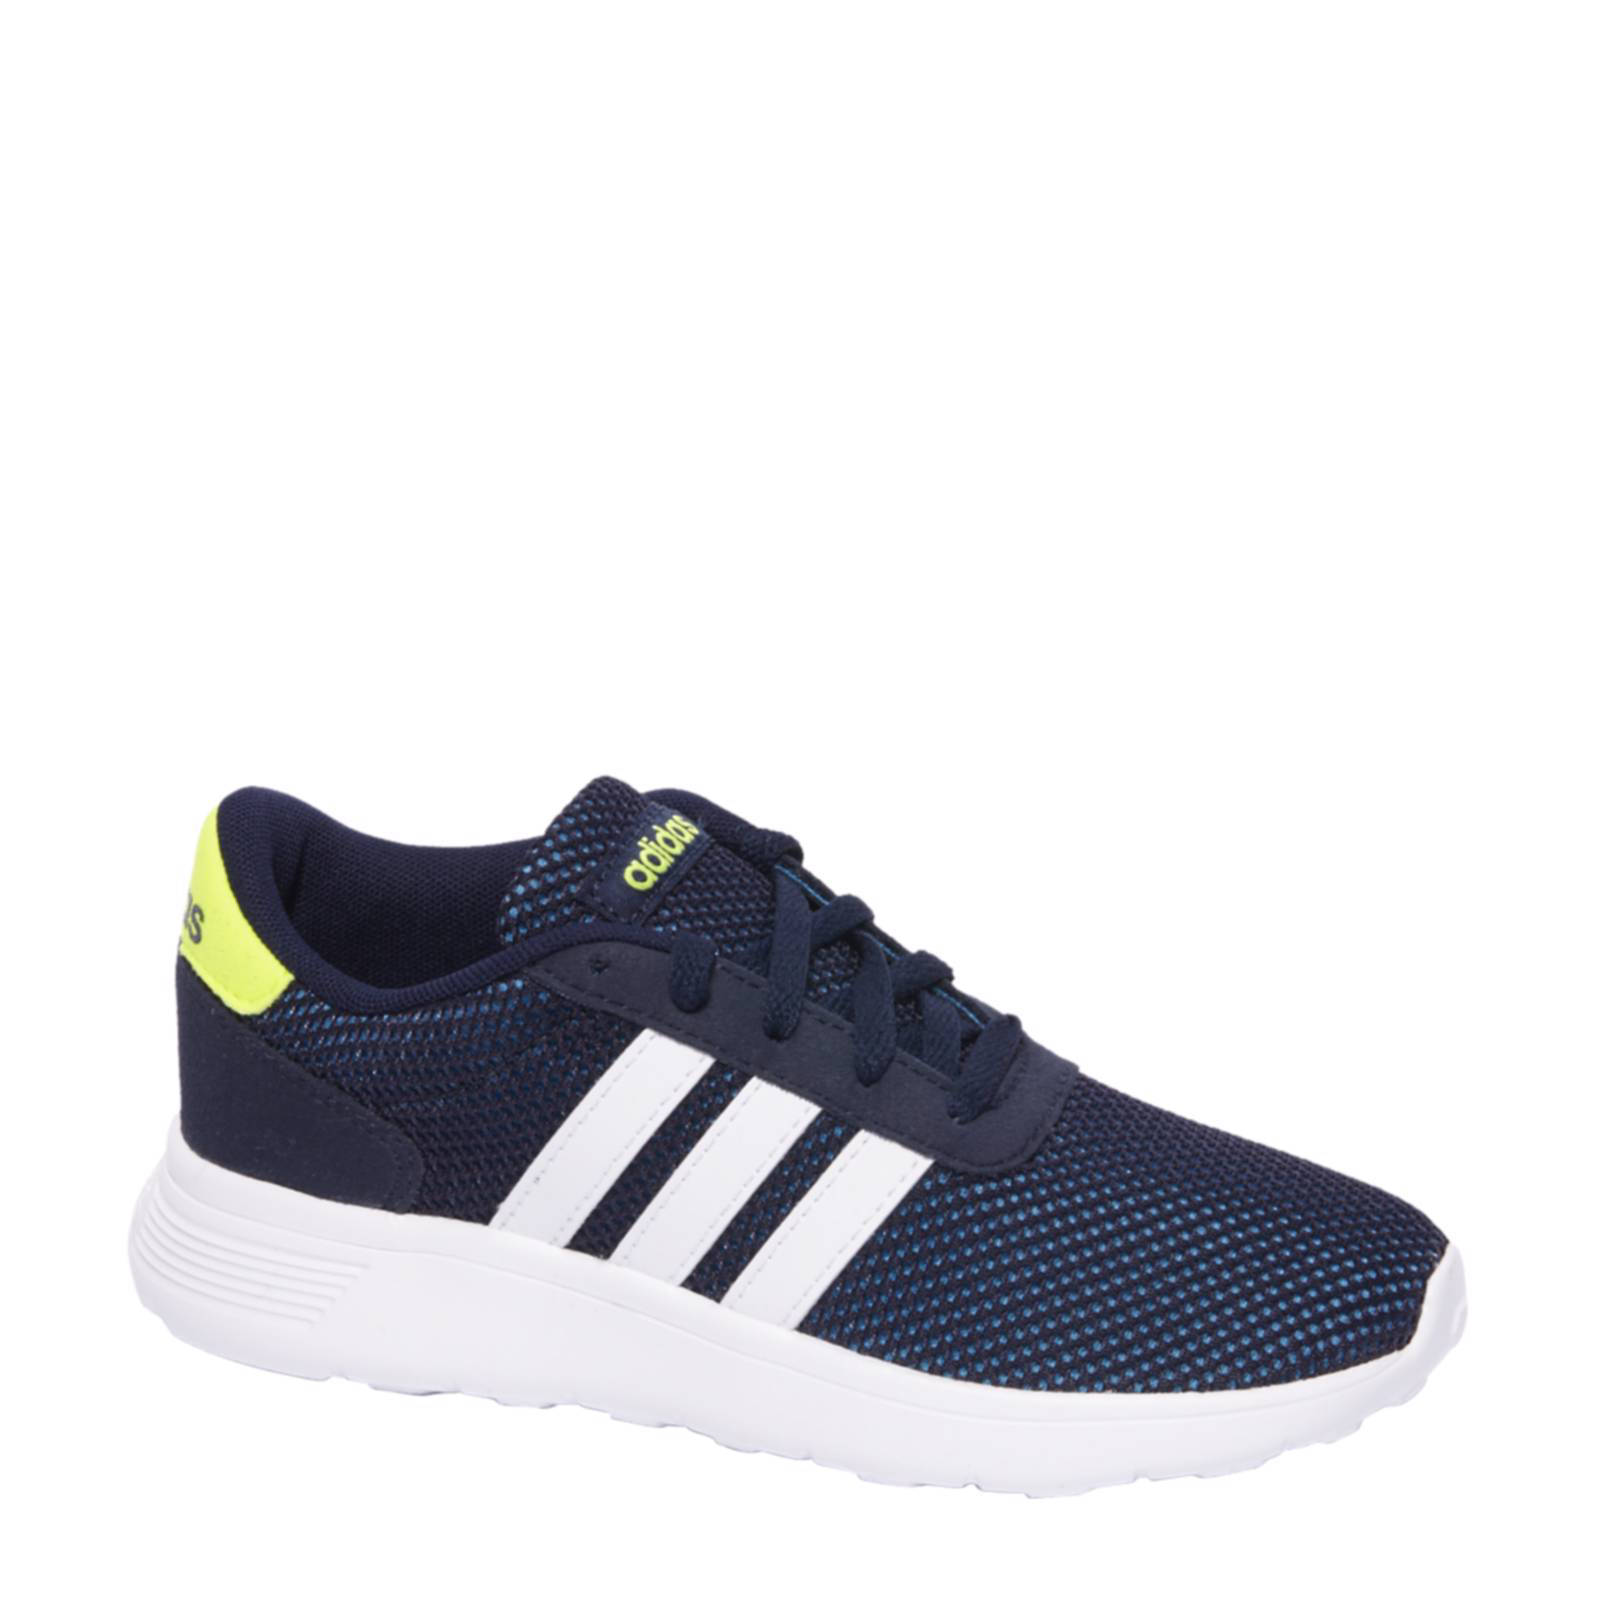 Lite Racer sneakers